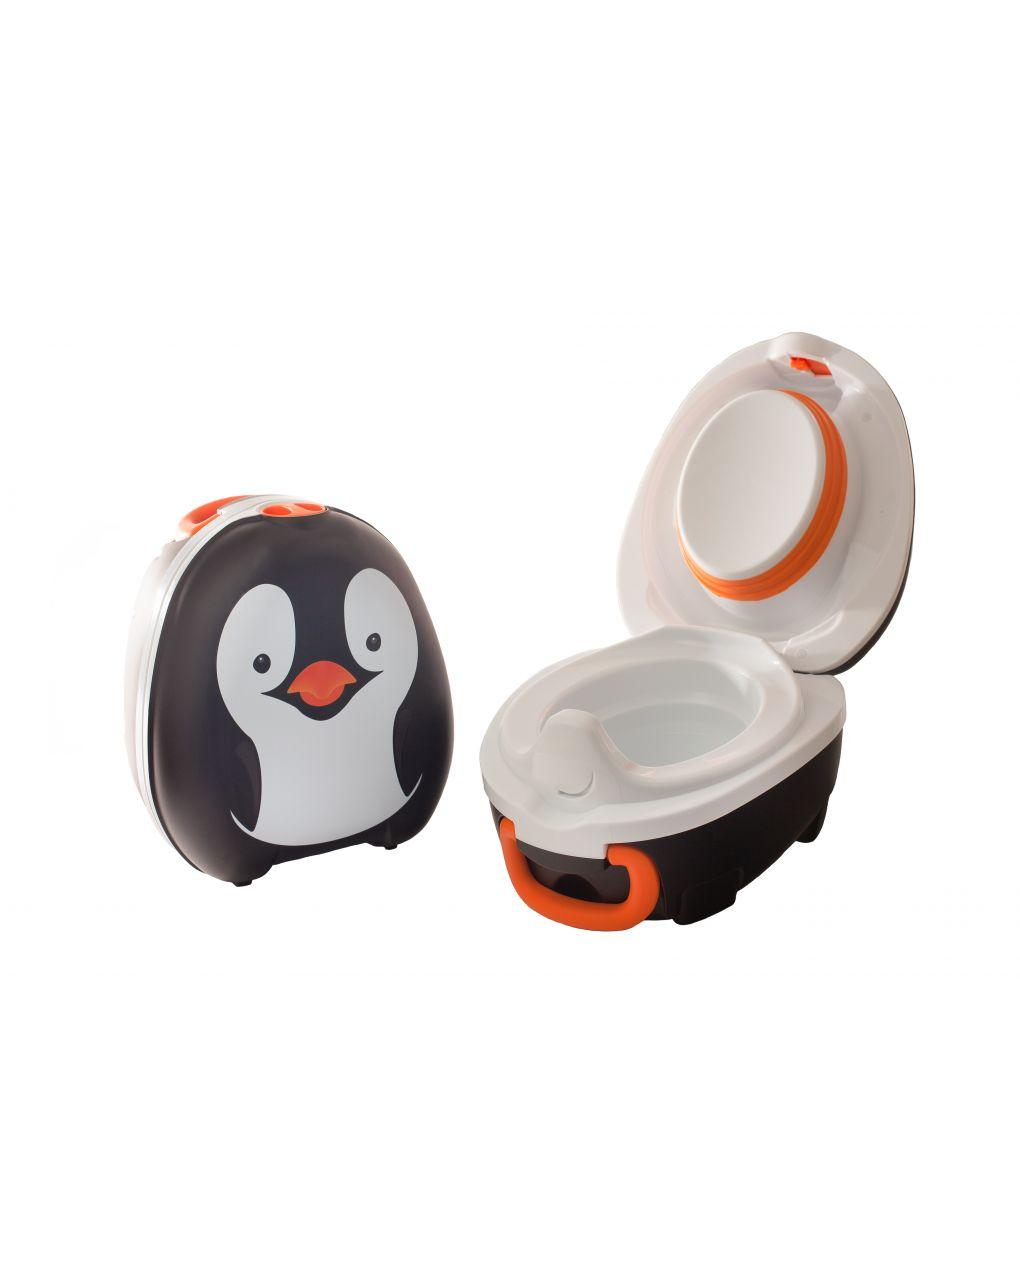 Giordani - mcp vasino pinguino 2021 - Giordani